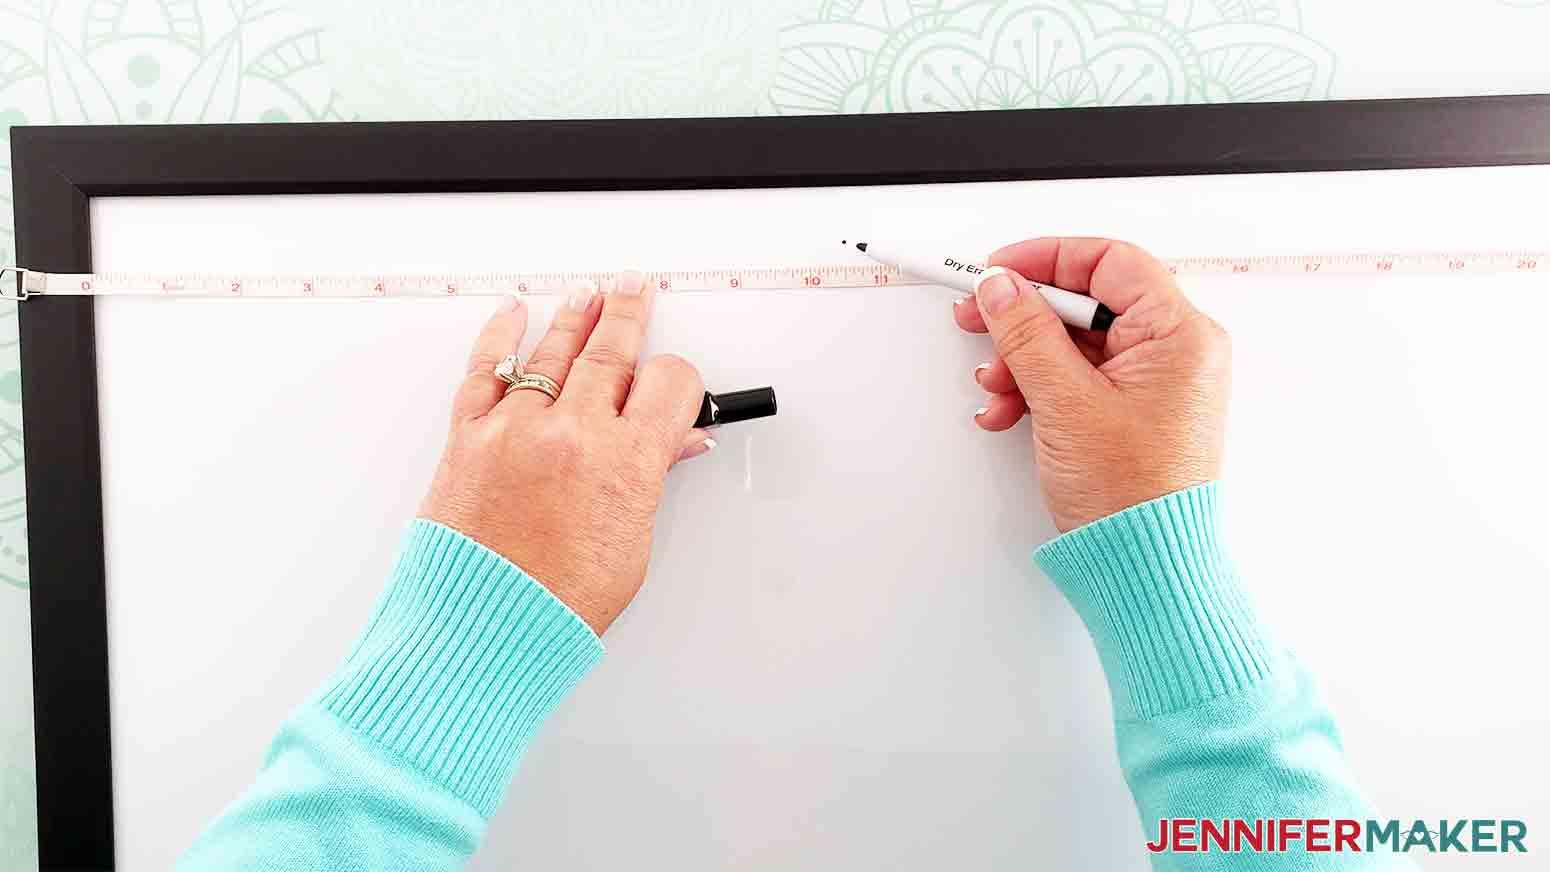 DIY-Whiteboard-Calendar-JenniferMaker-measure-and-mark-center-whiteboard